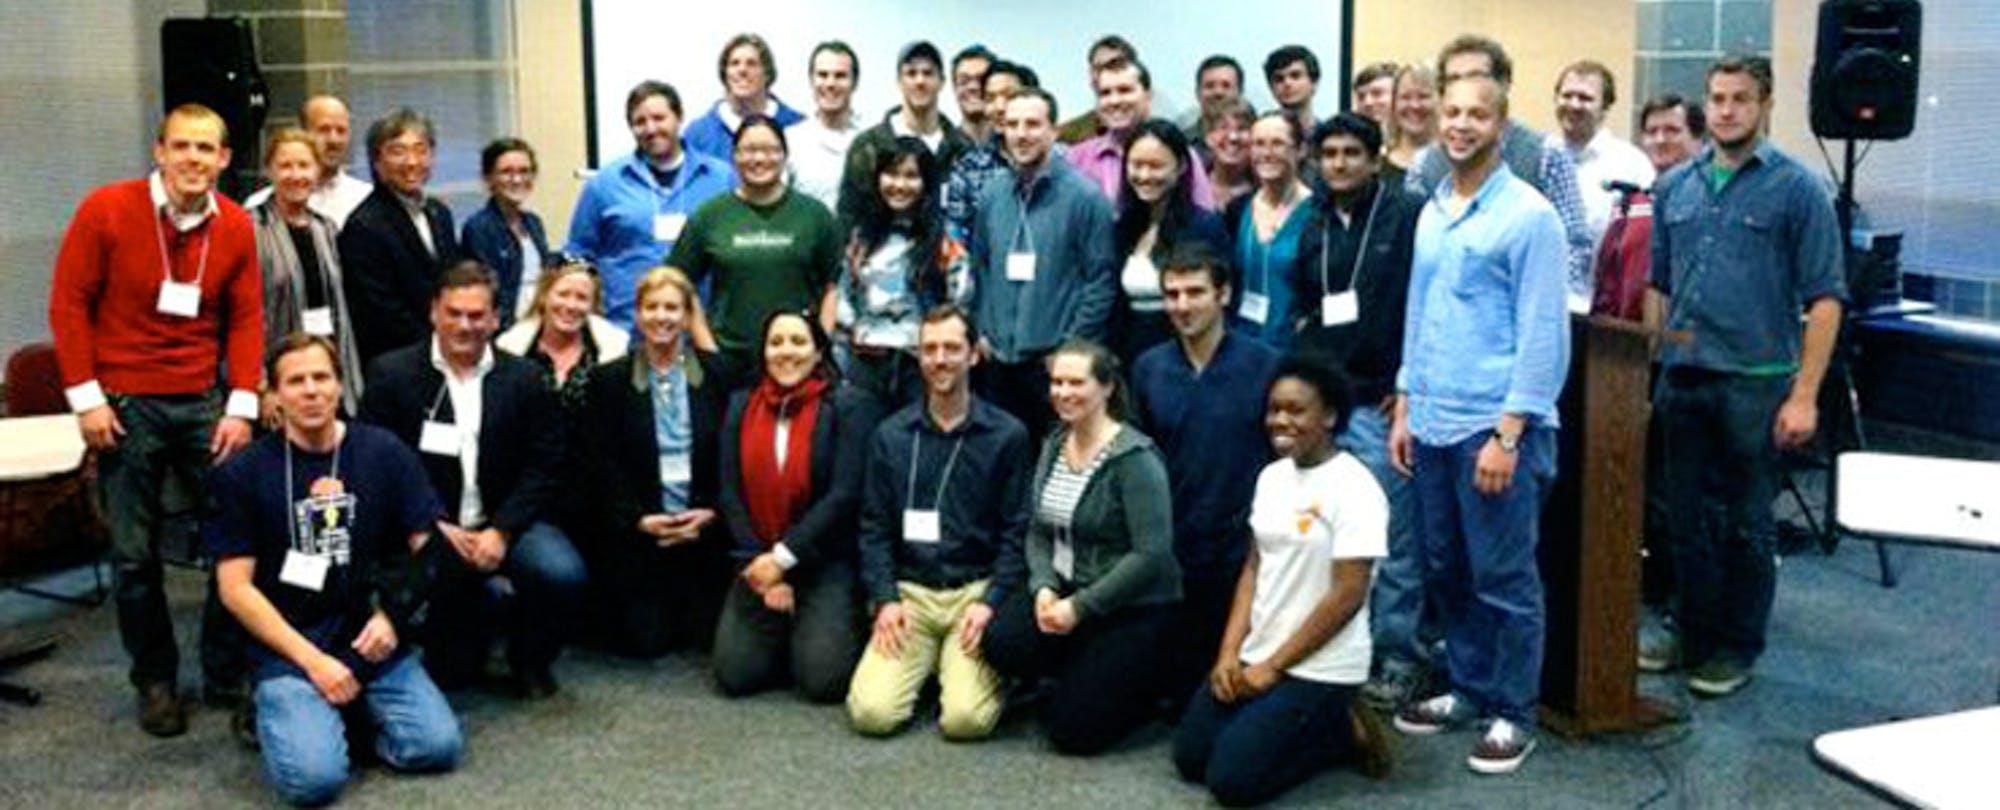 Startup Weekend EDU Heads to Charlottesville